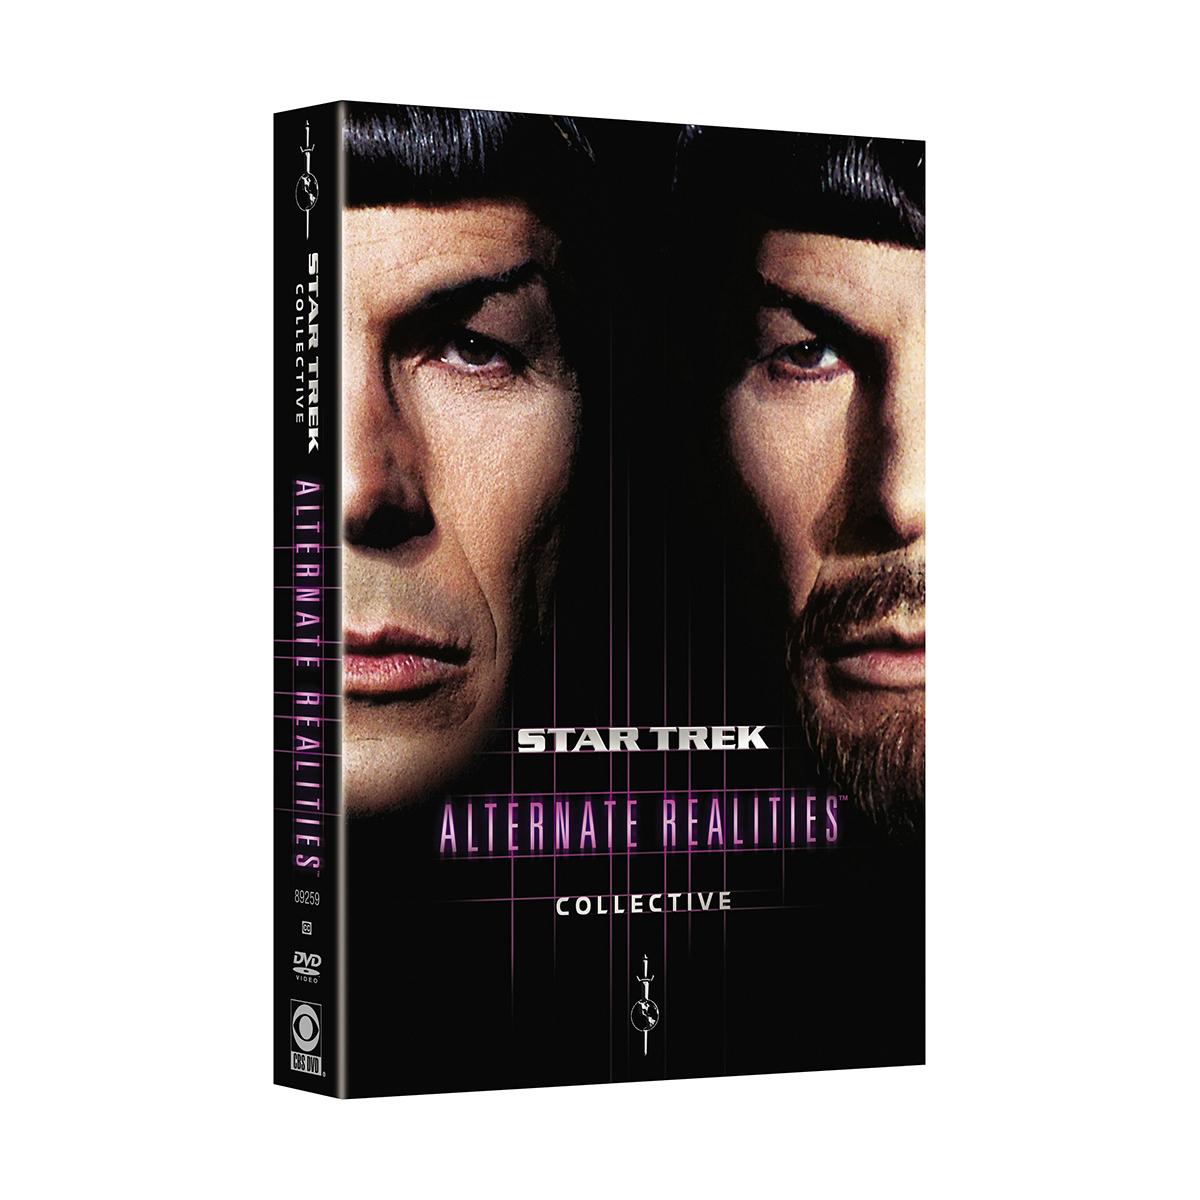 Star Trek: Fan Collection - Alternate Realities DVD